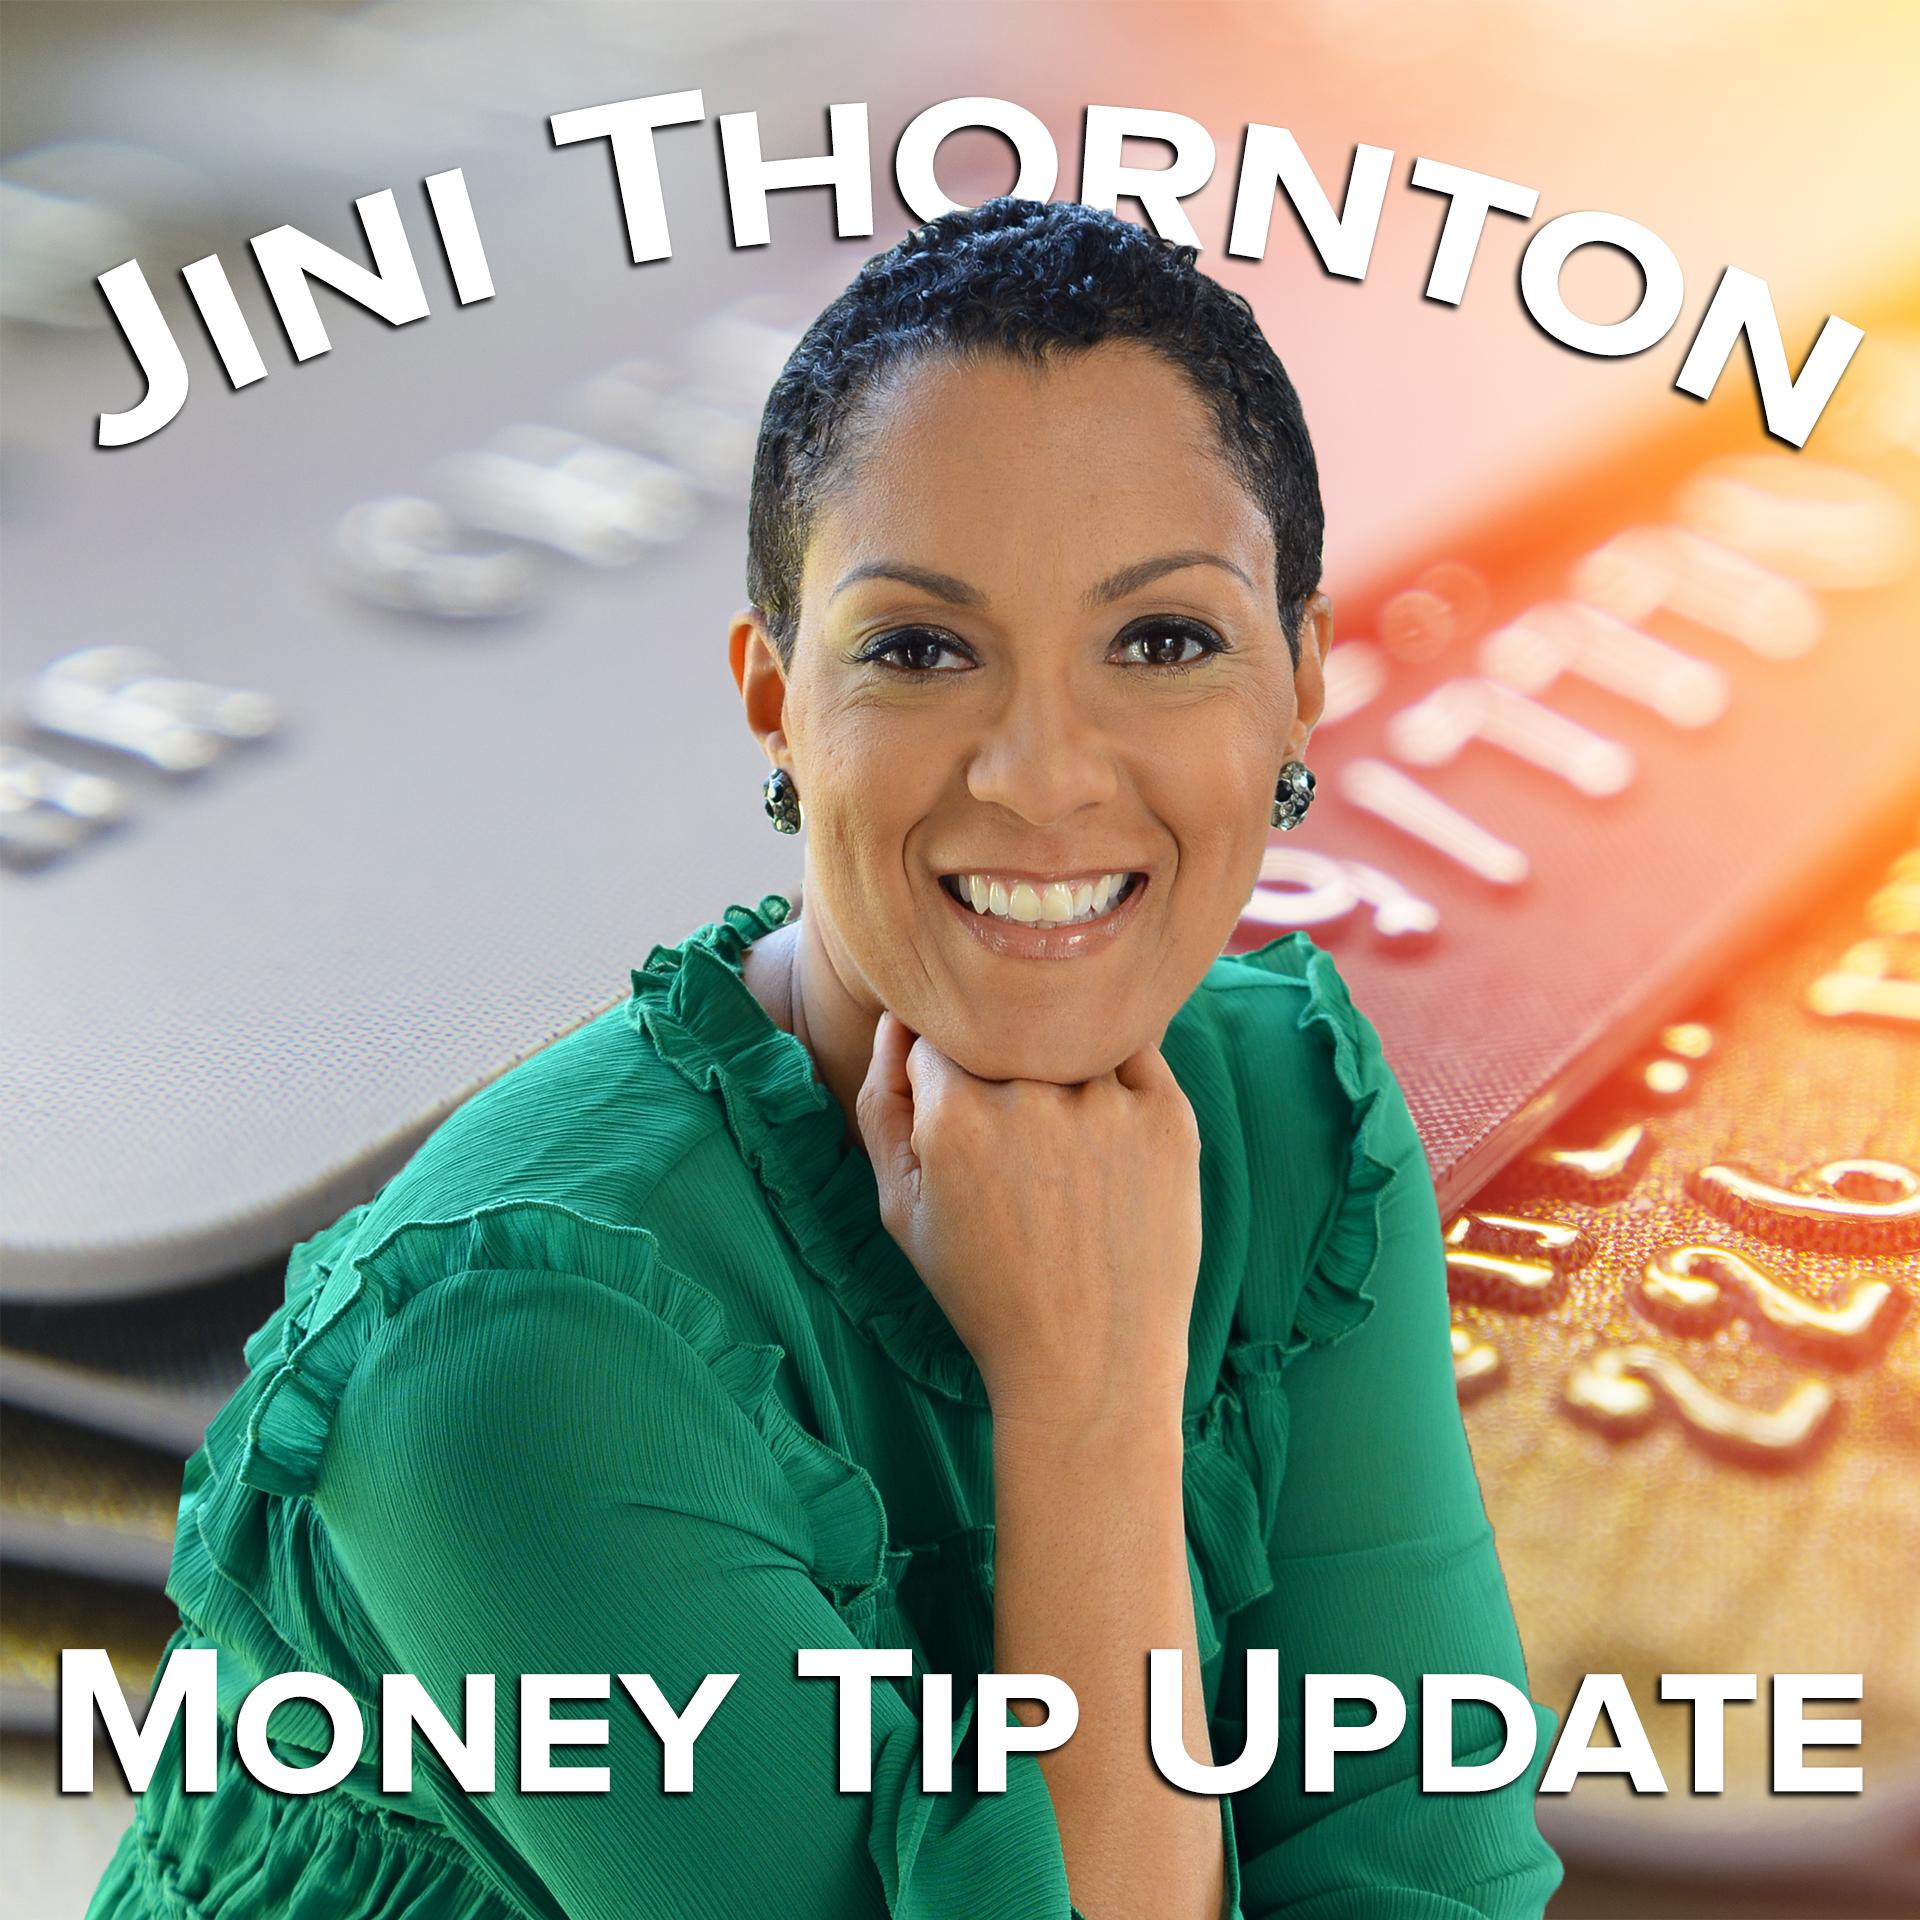 Jini Thornton Money Tip Update